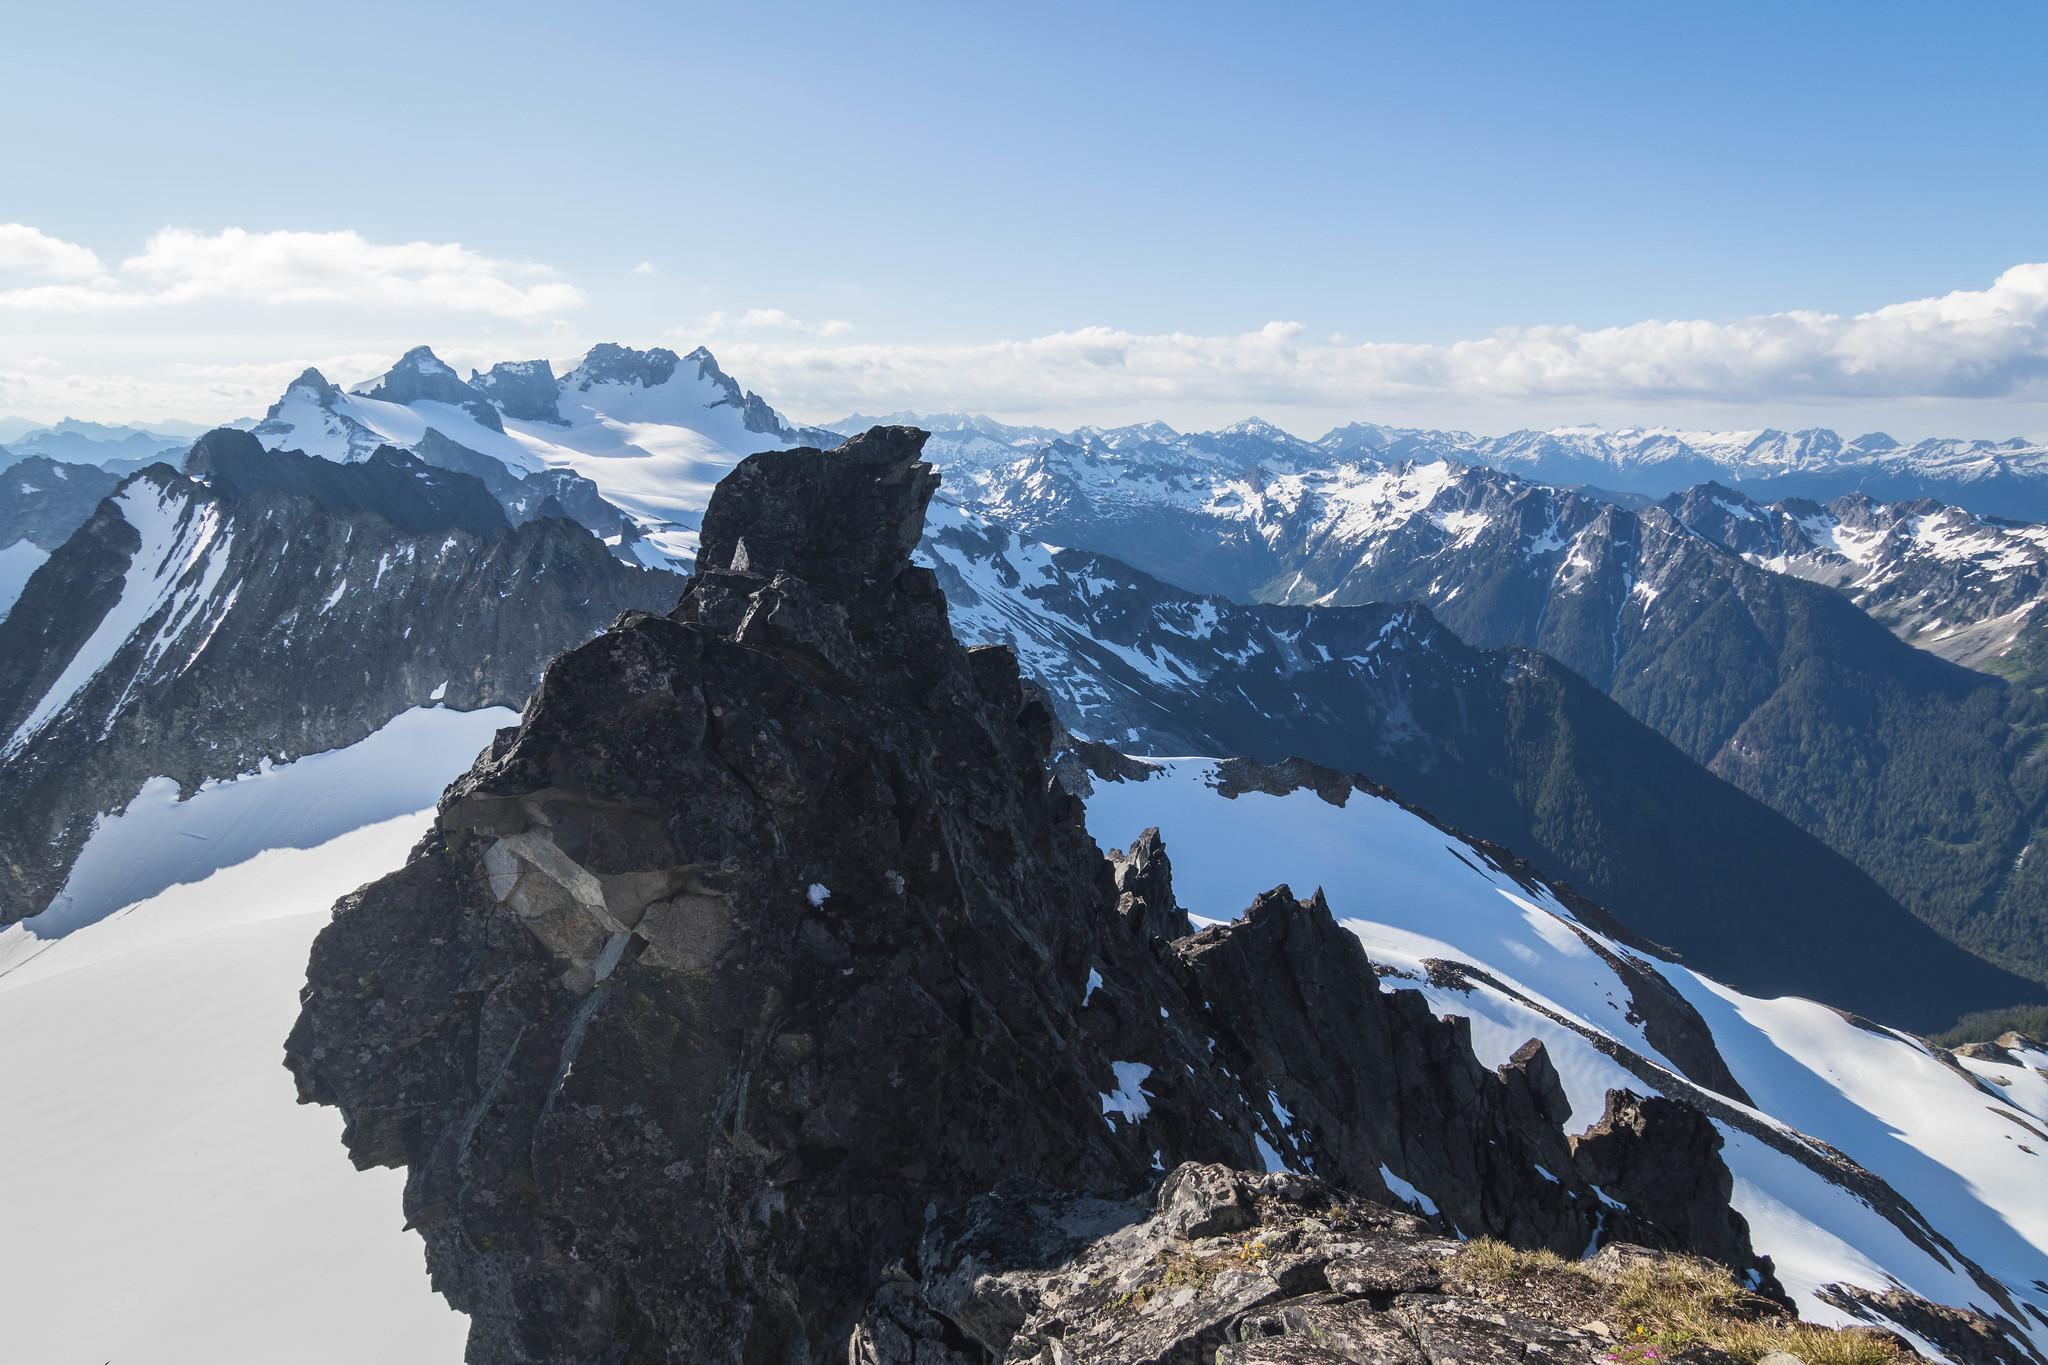 On southeast ridge